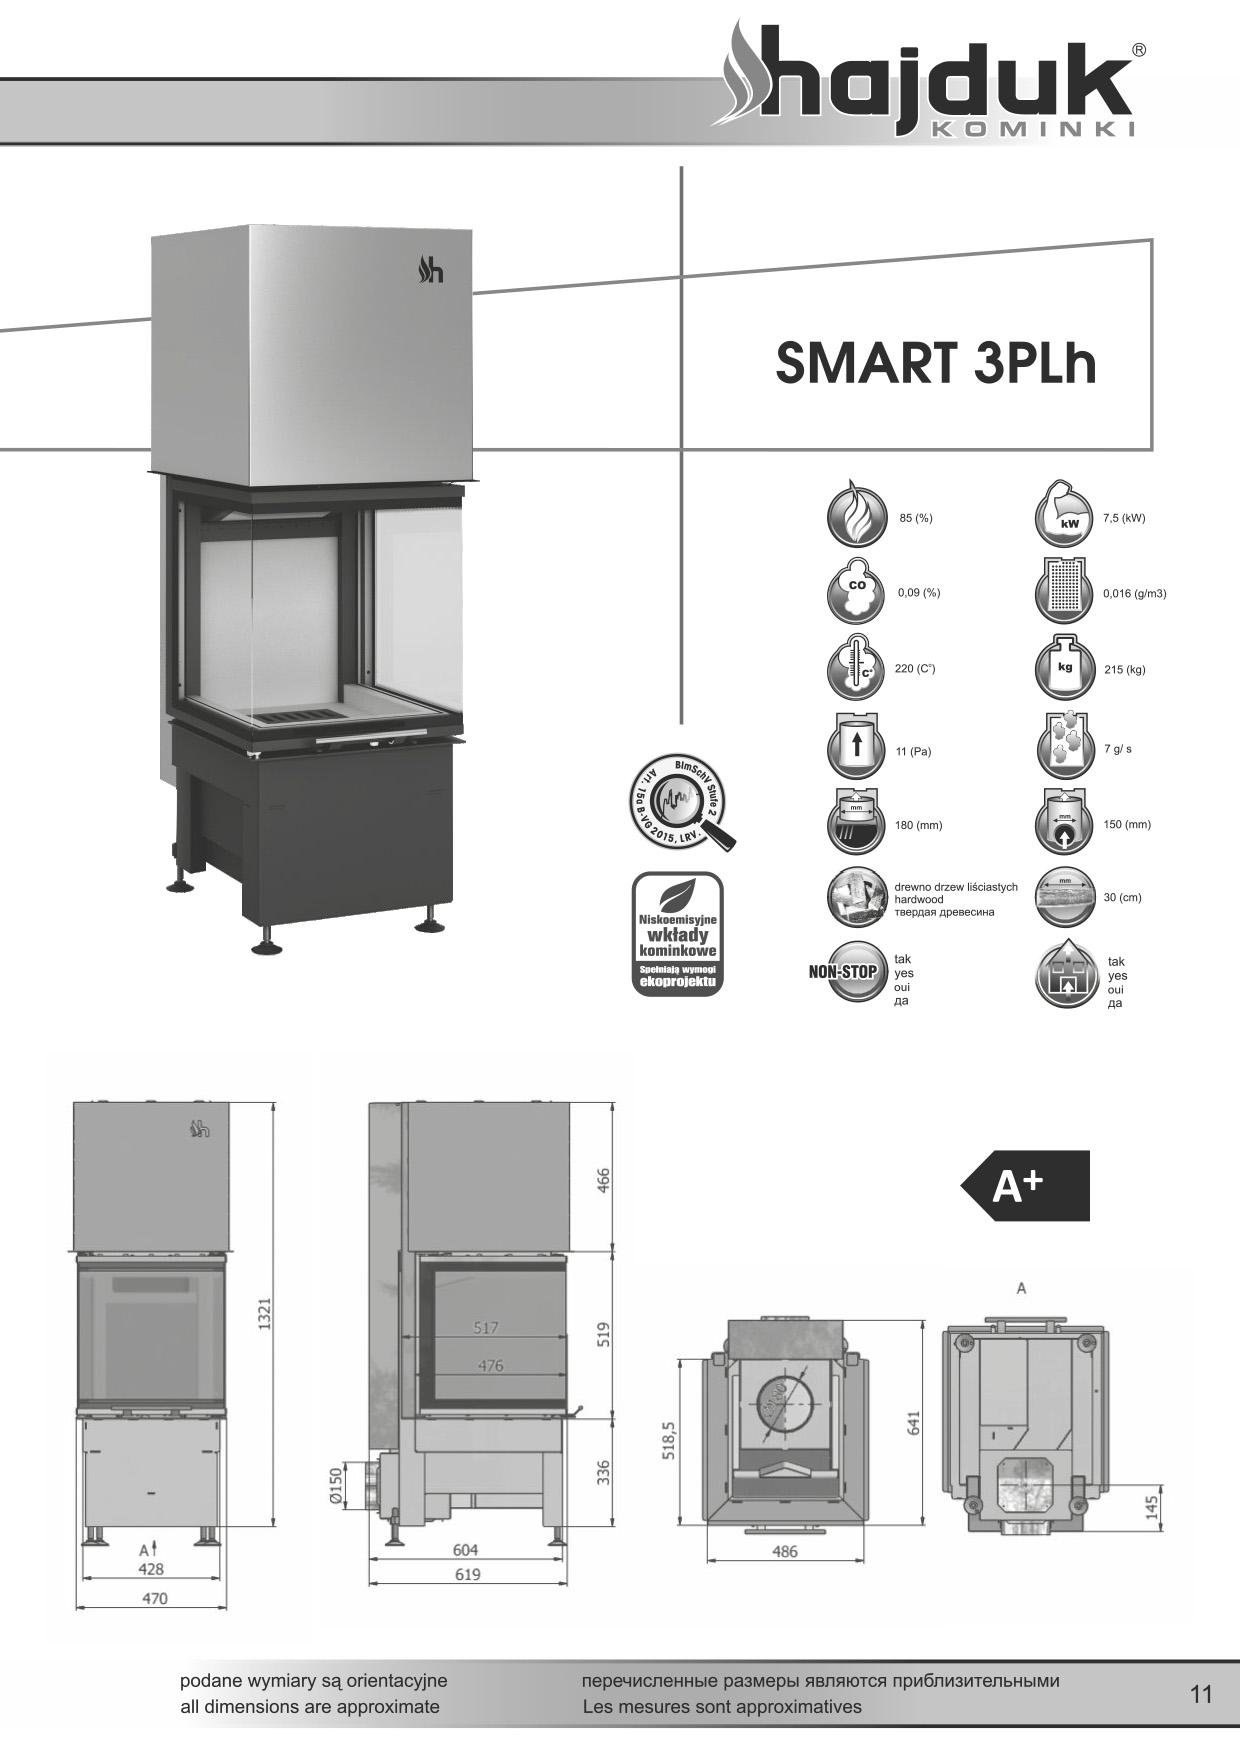 Smart%203PLh%20 %20karta%20techniczna - Fireplace insert Hajduk Smart 3PLh black chamotte